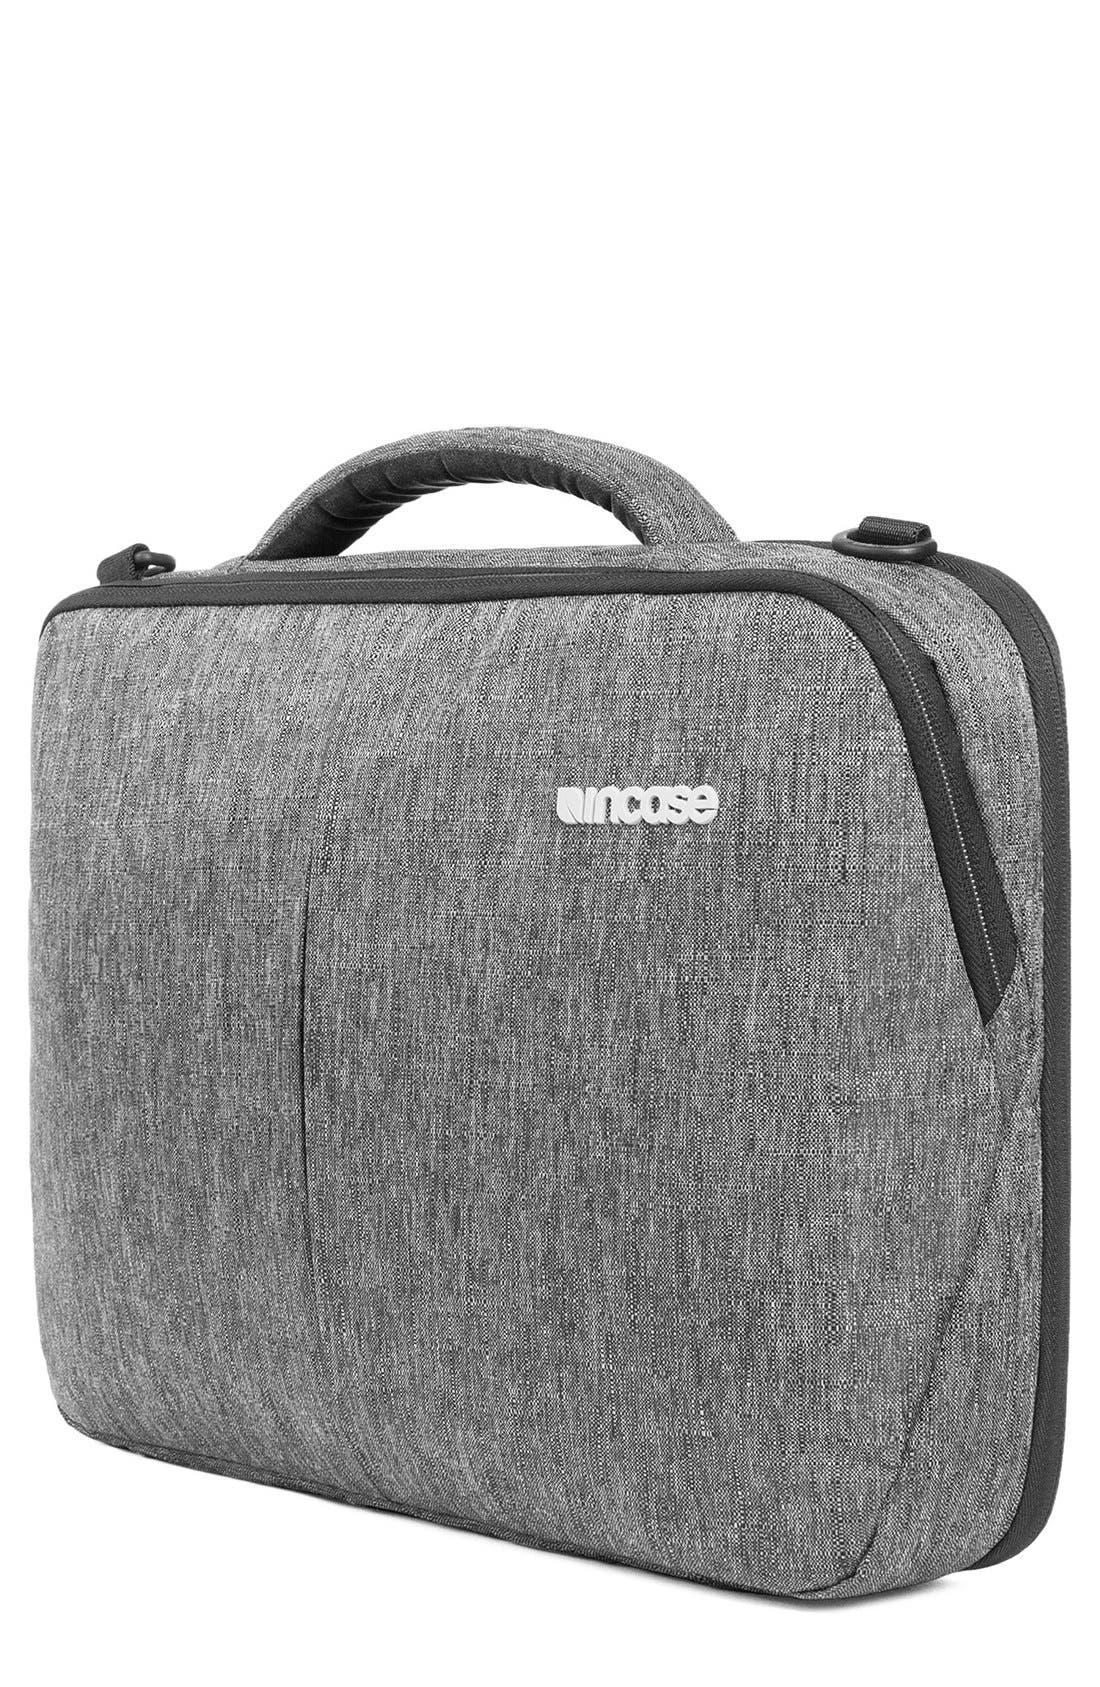 "Main Image - Incase Designs 'Reform' 13"" Laptop Briefcase"